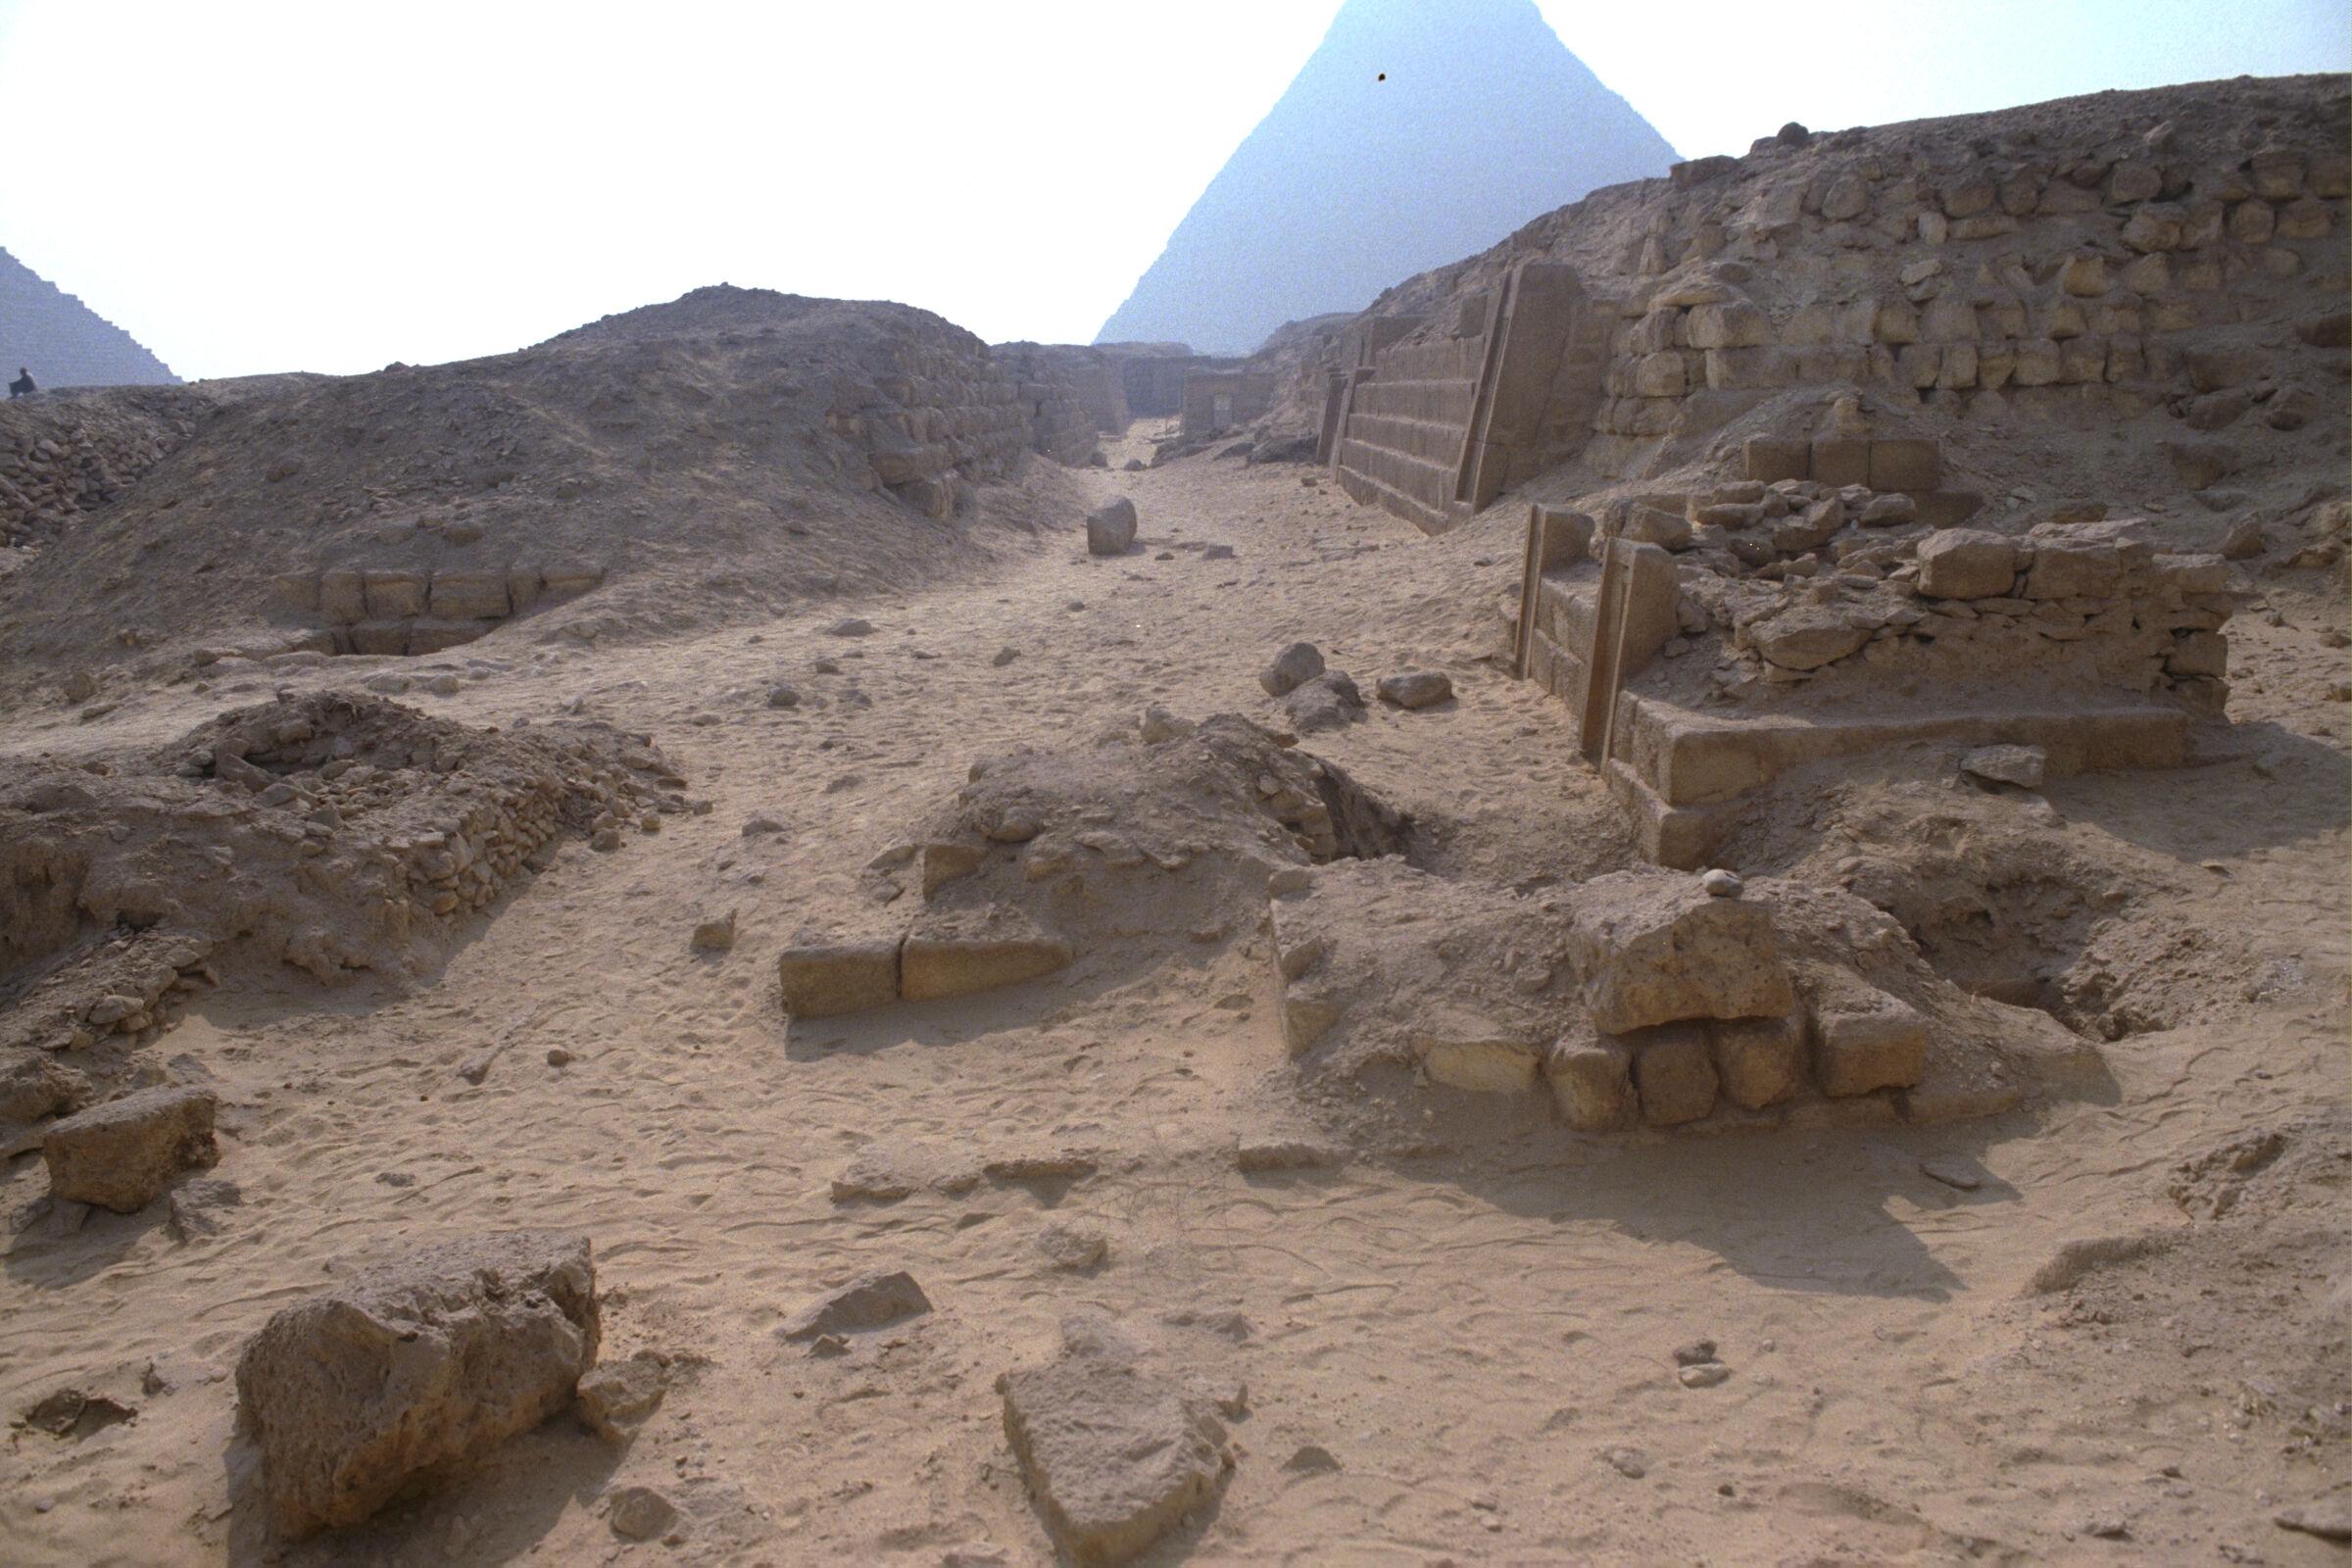 Western Cemetery: Site: Giza; View: G 2150, G 2151, G 2153, G 2152, G 2136', G 2154, G 2157, G 2170